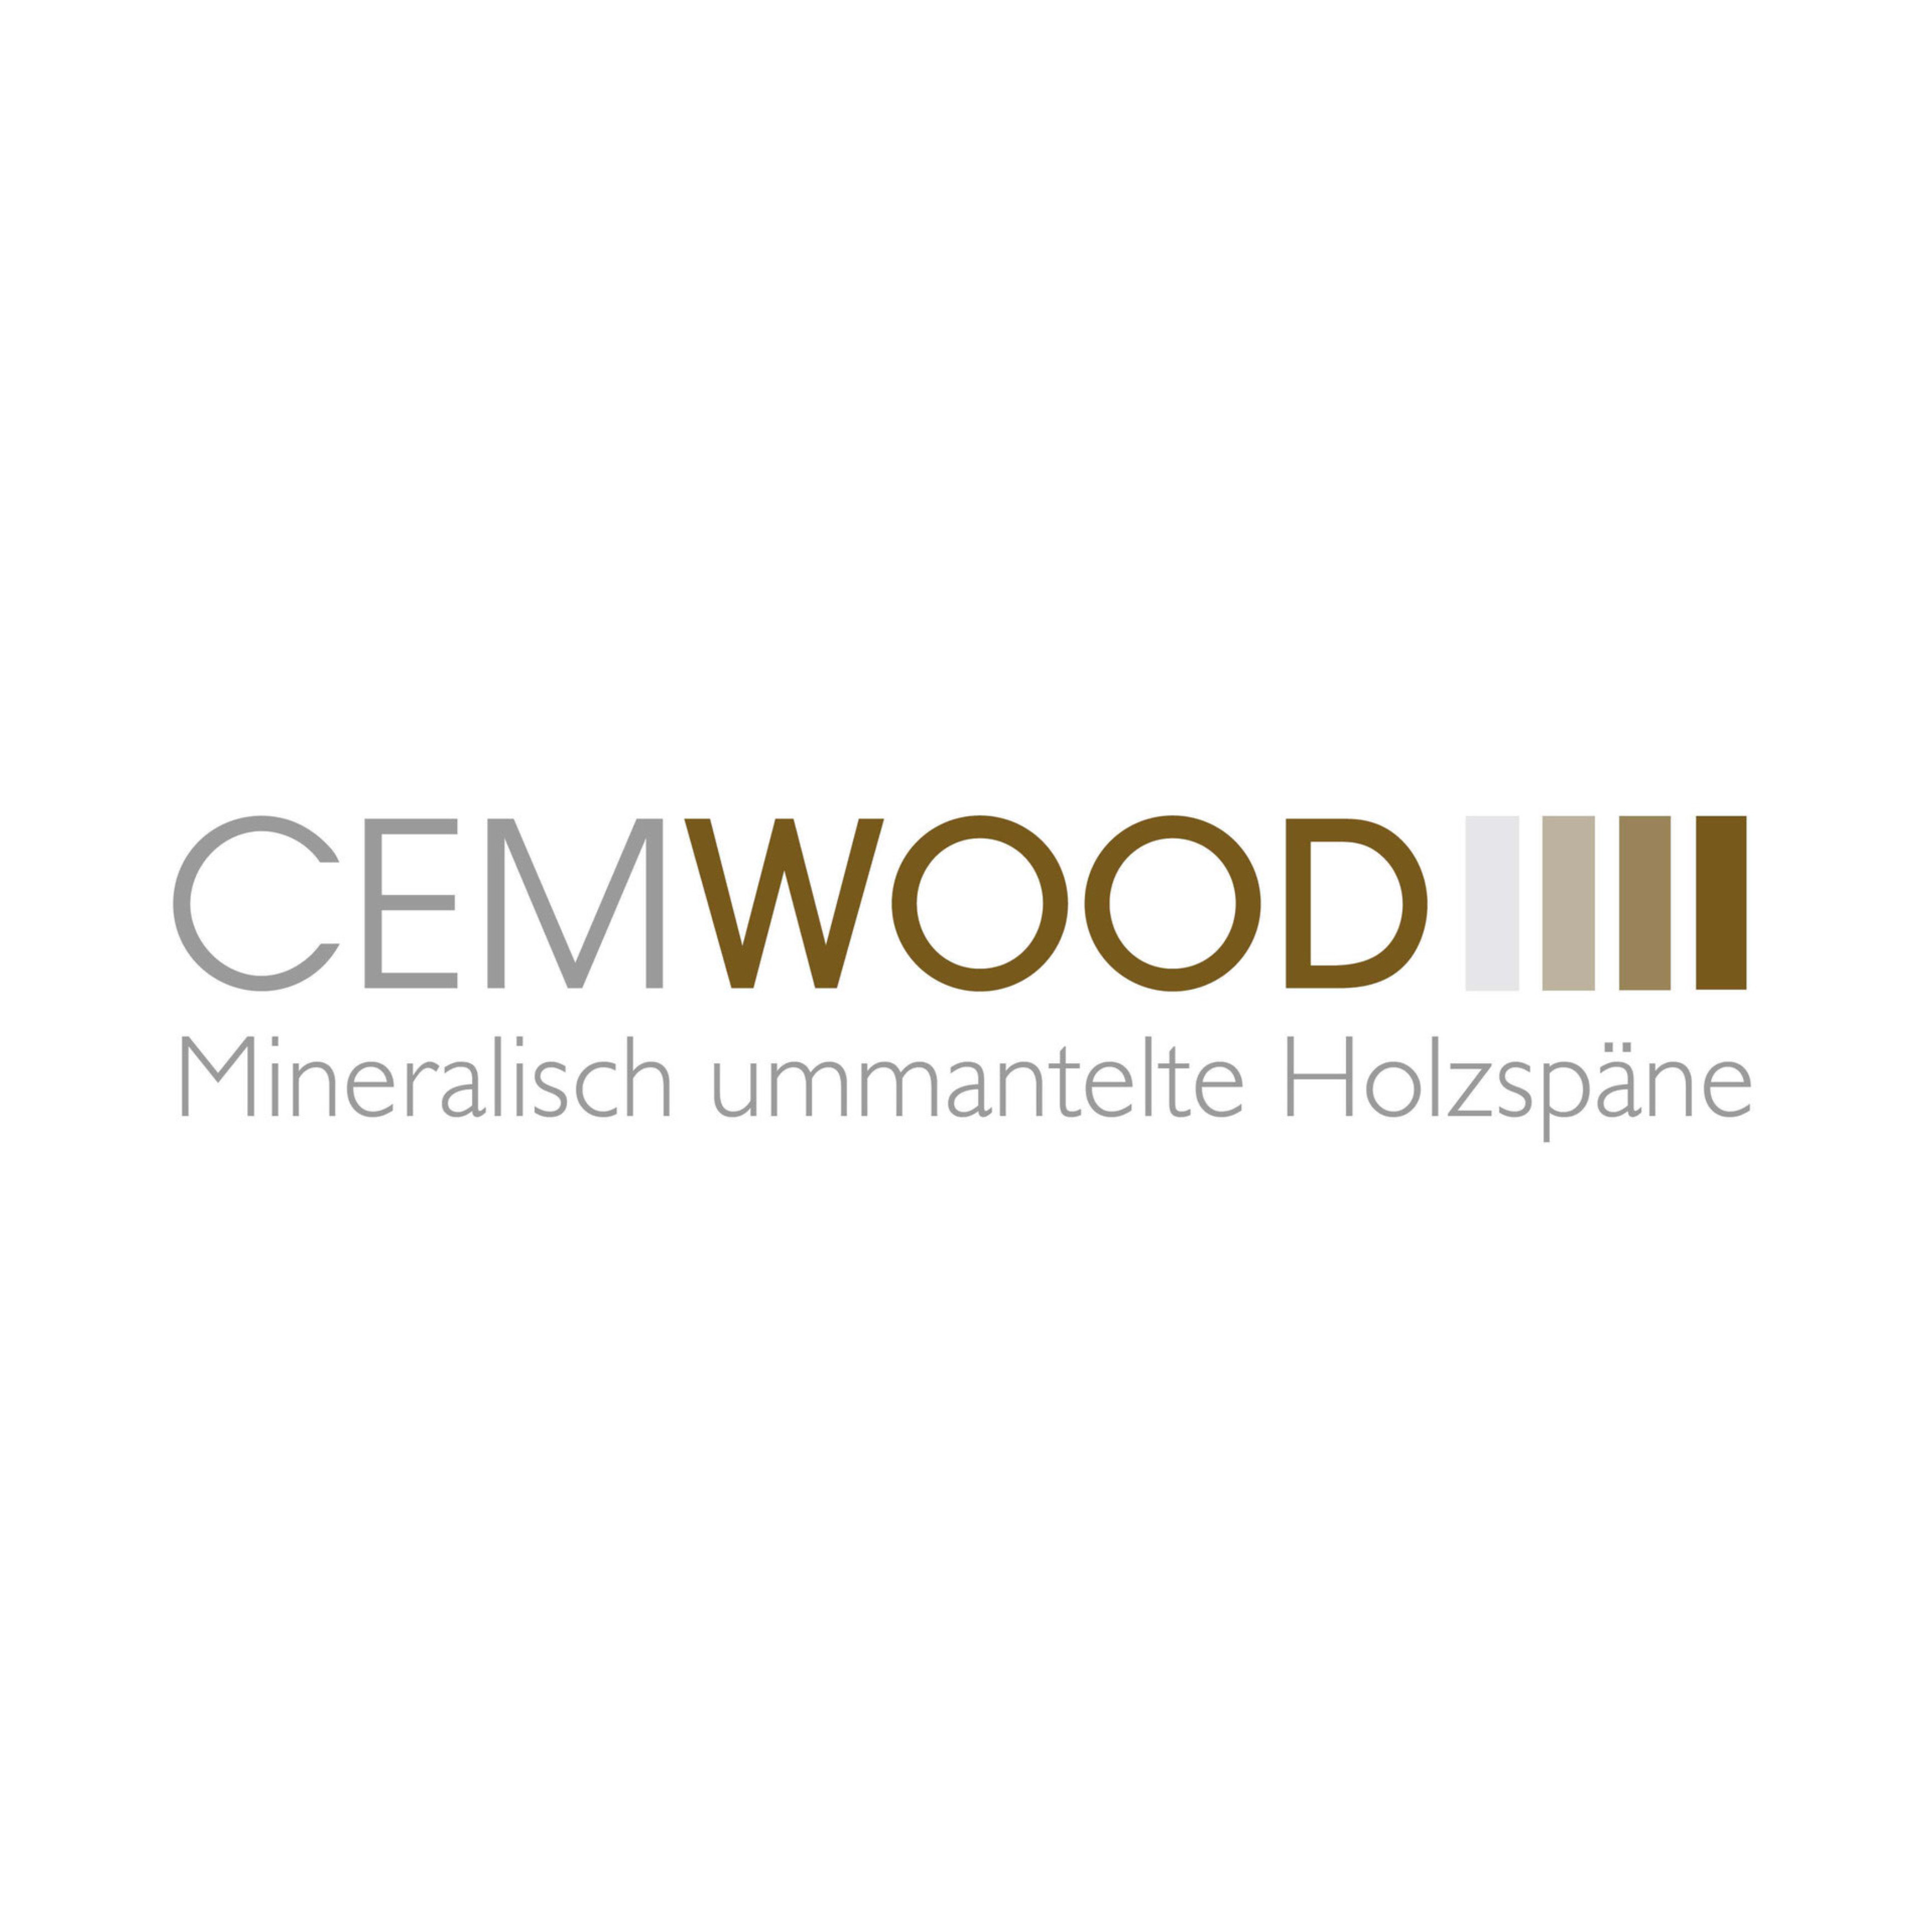 CEMWOOD GmbH